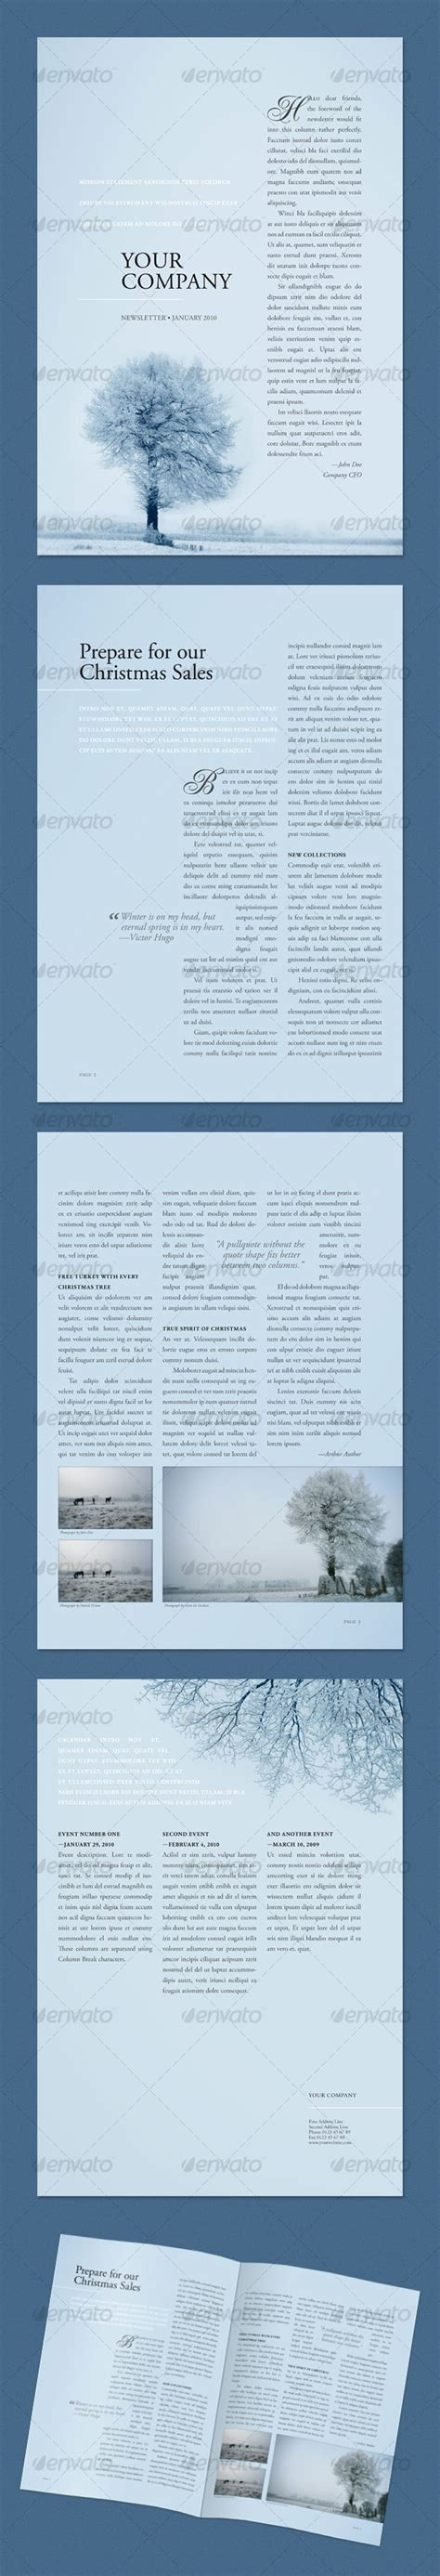 contoh layout newsletter contoh newsletter 187 fixride com